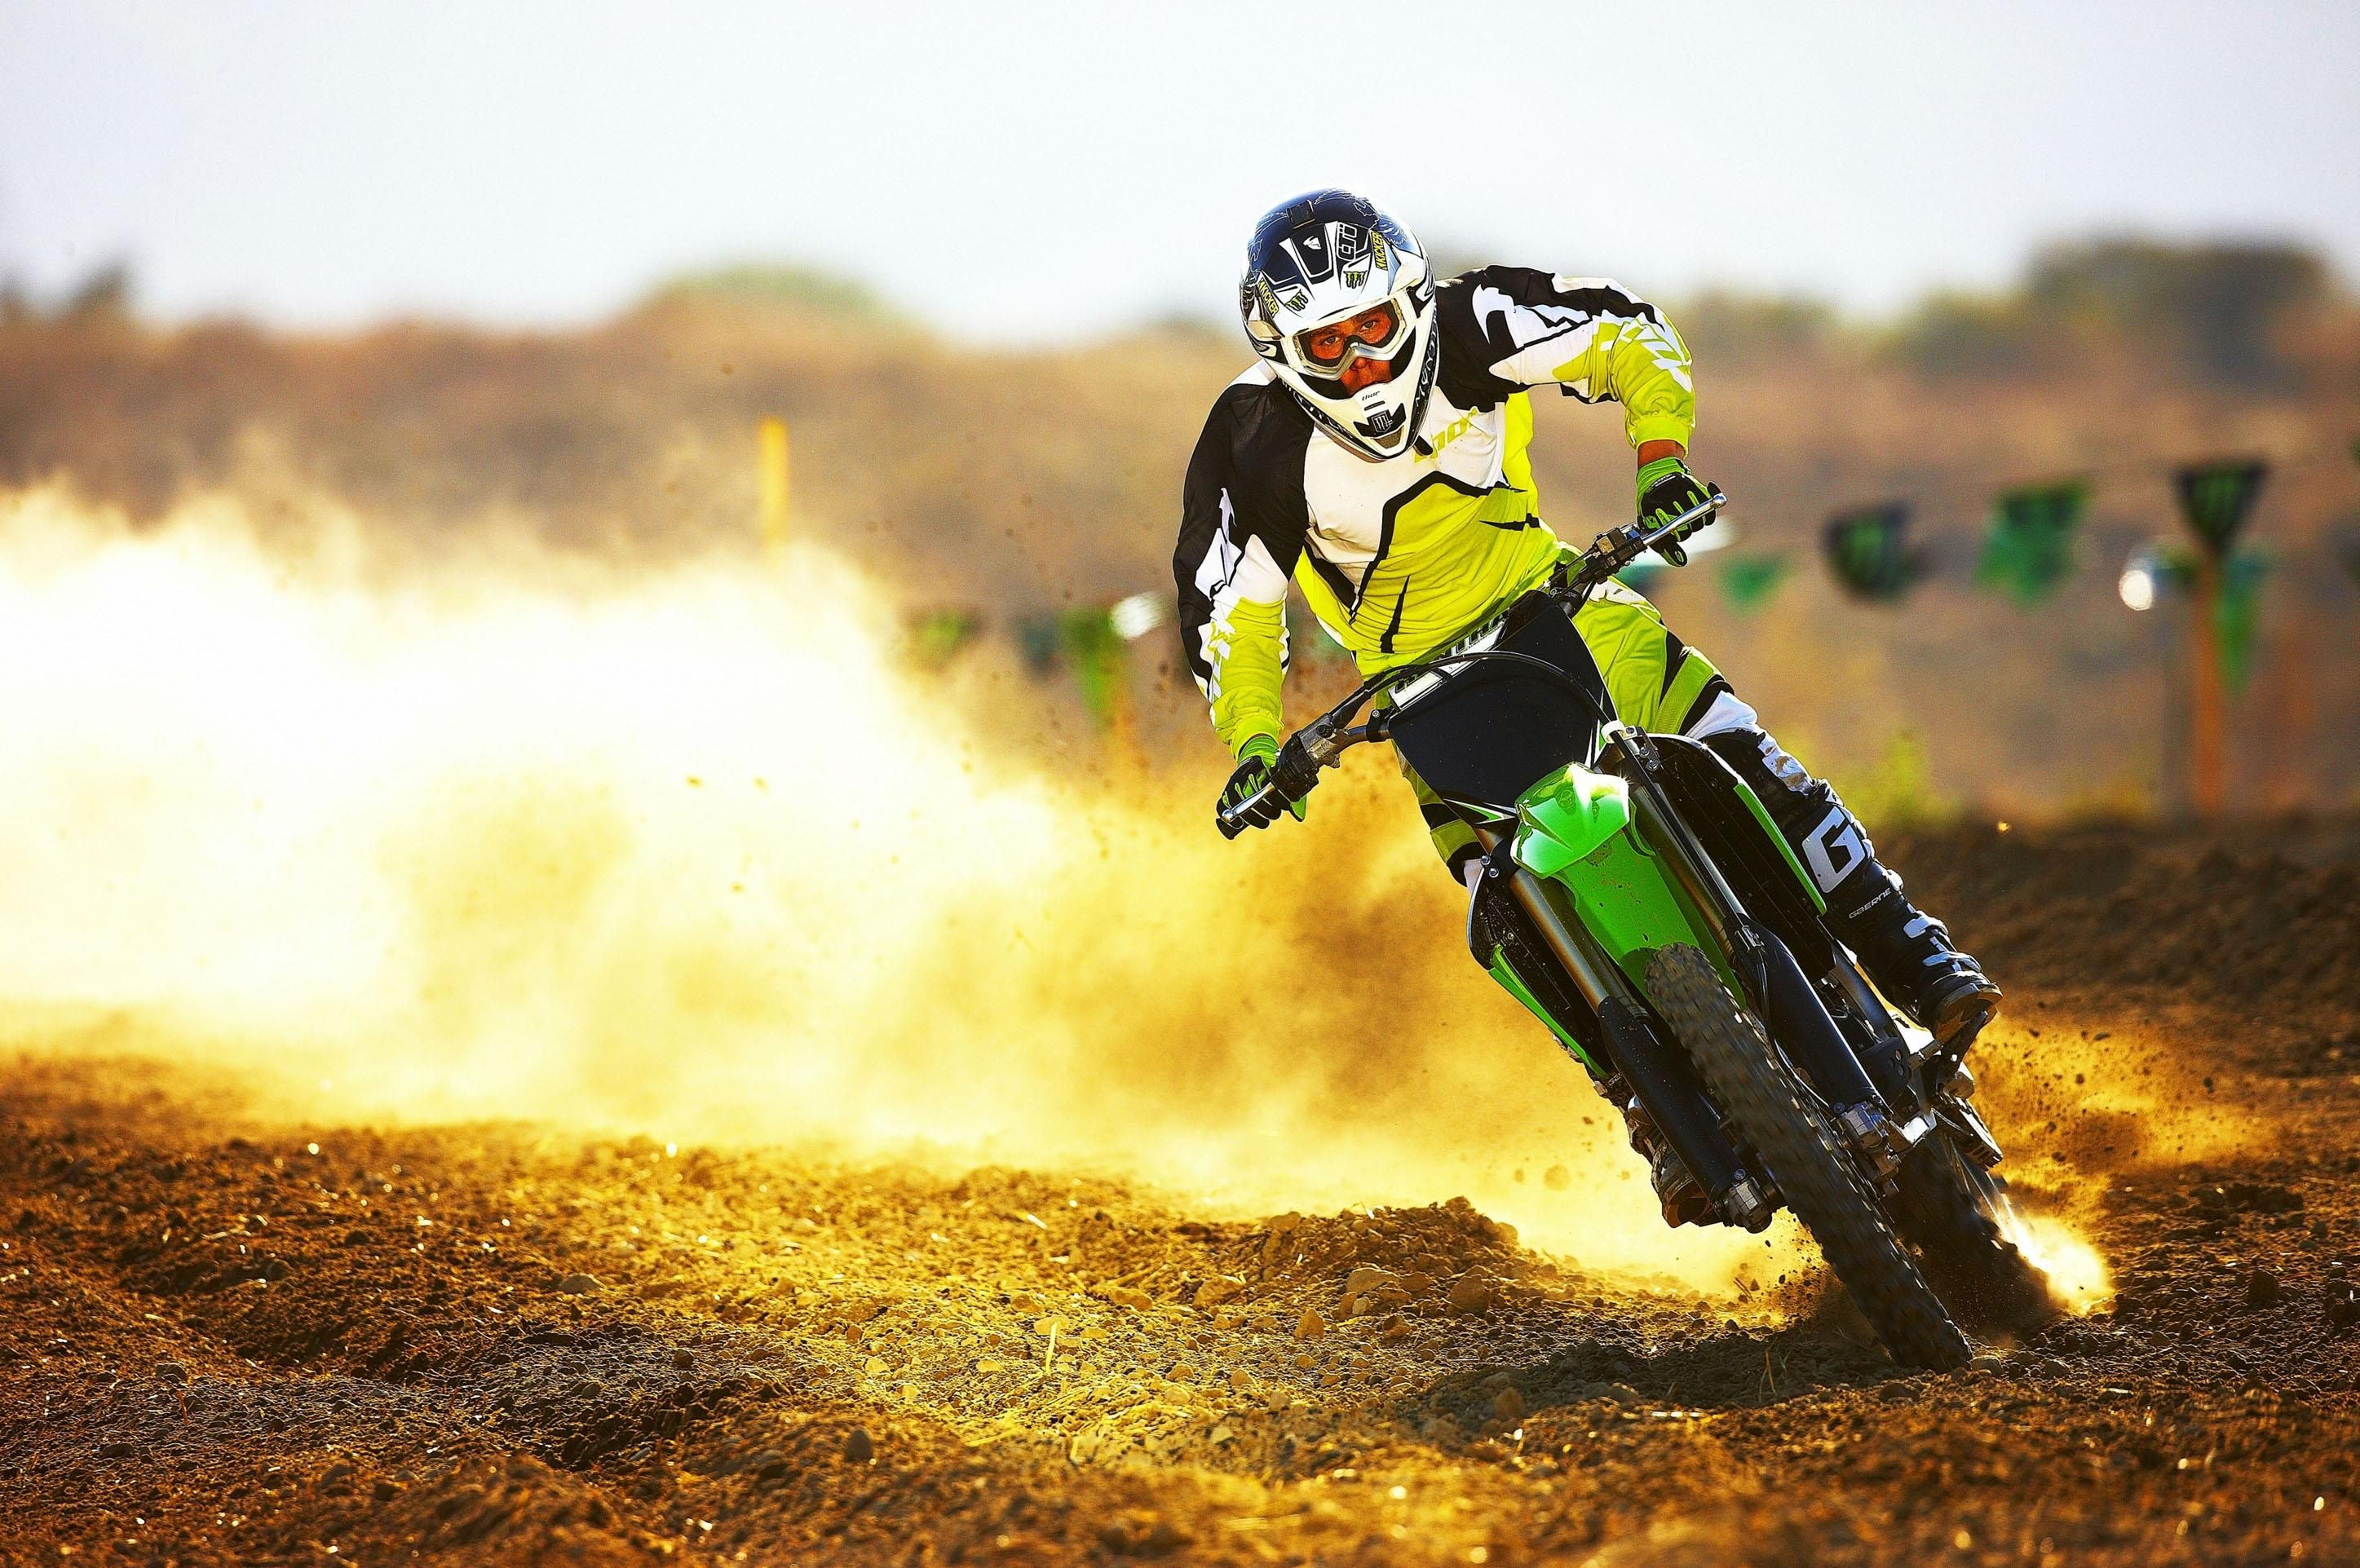 Kawasaki Dirt Bike Wallpapers Mobile Other Wallpaper